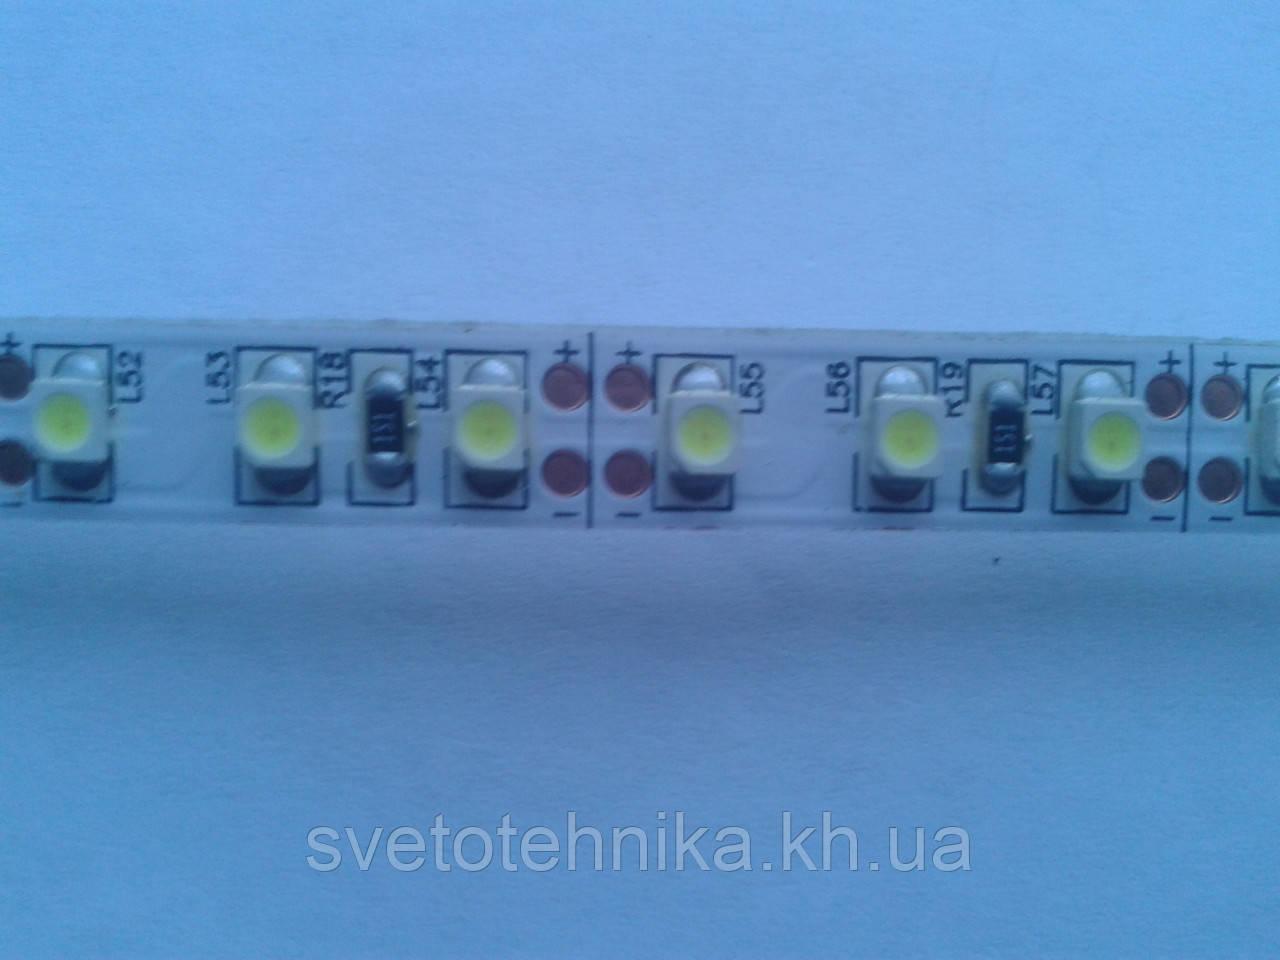 Лента MagicLed (чип пр-ва Тайвань) стандартной яркости без сил 2-я плотность(120шт/м) белая тёплая